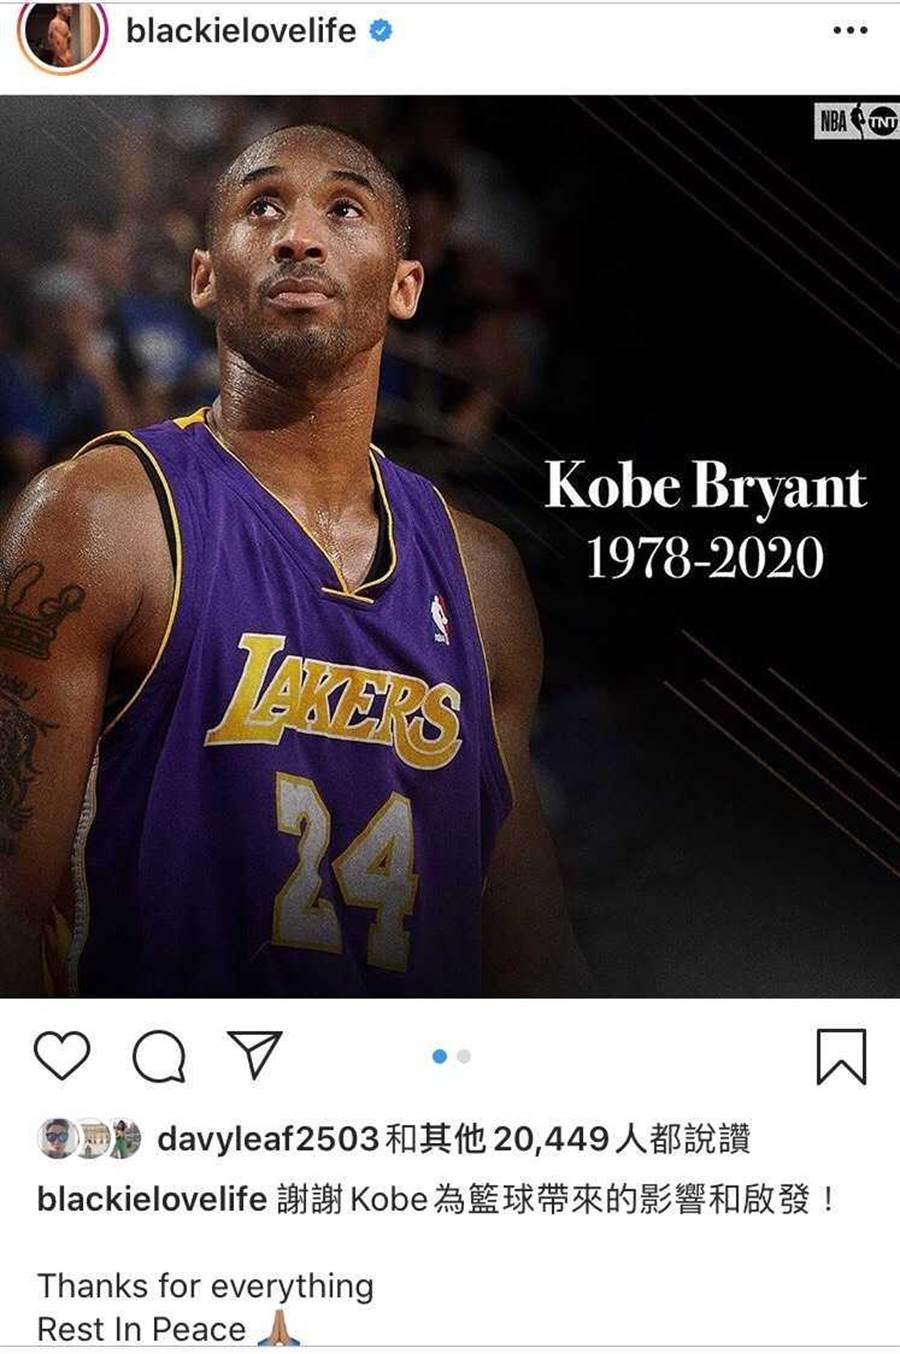 NBA一代傳奇球星Kobe Bryant不幸墜機罹難,享年41歲,與Kobe頗有交情的「黑人」陳建州,在FB和IG上發文悼念。(圖/翻攝陳建州IG)